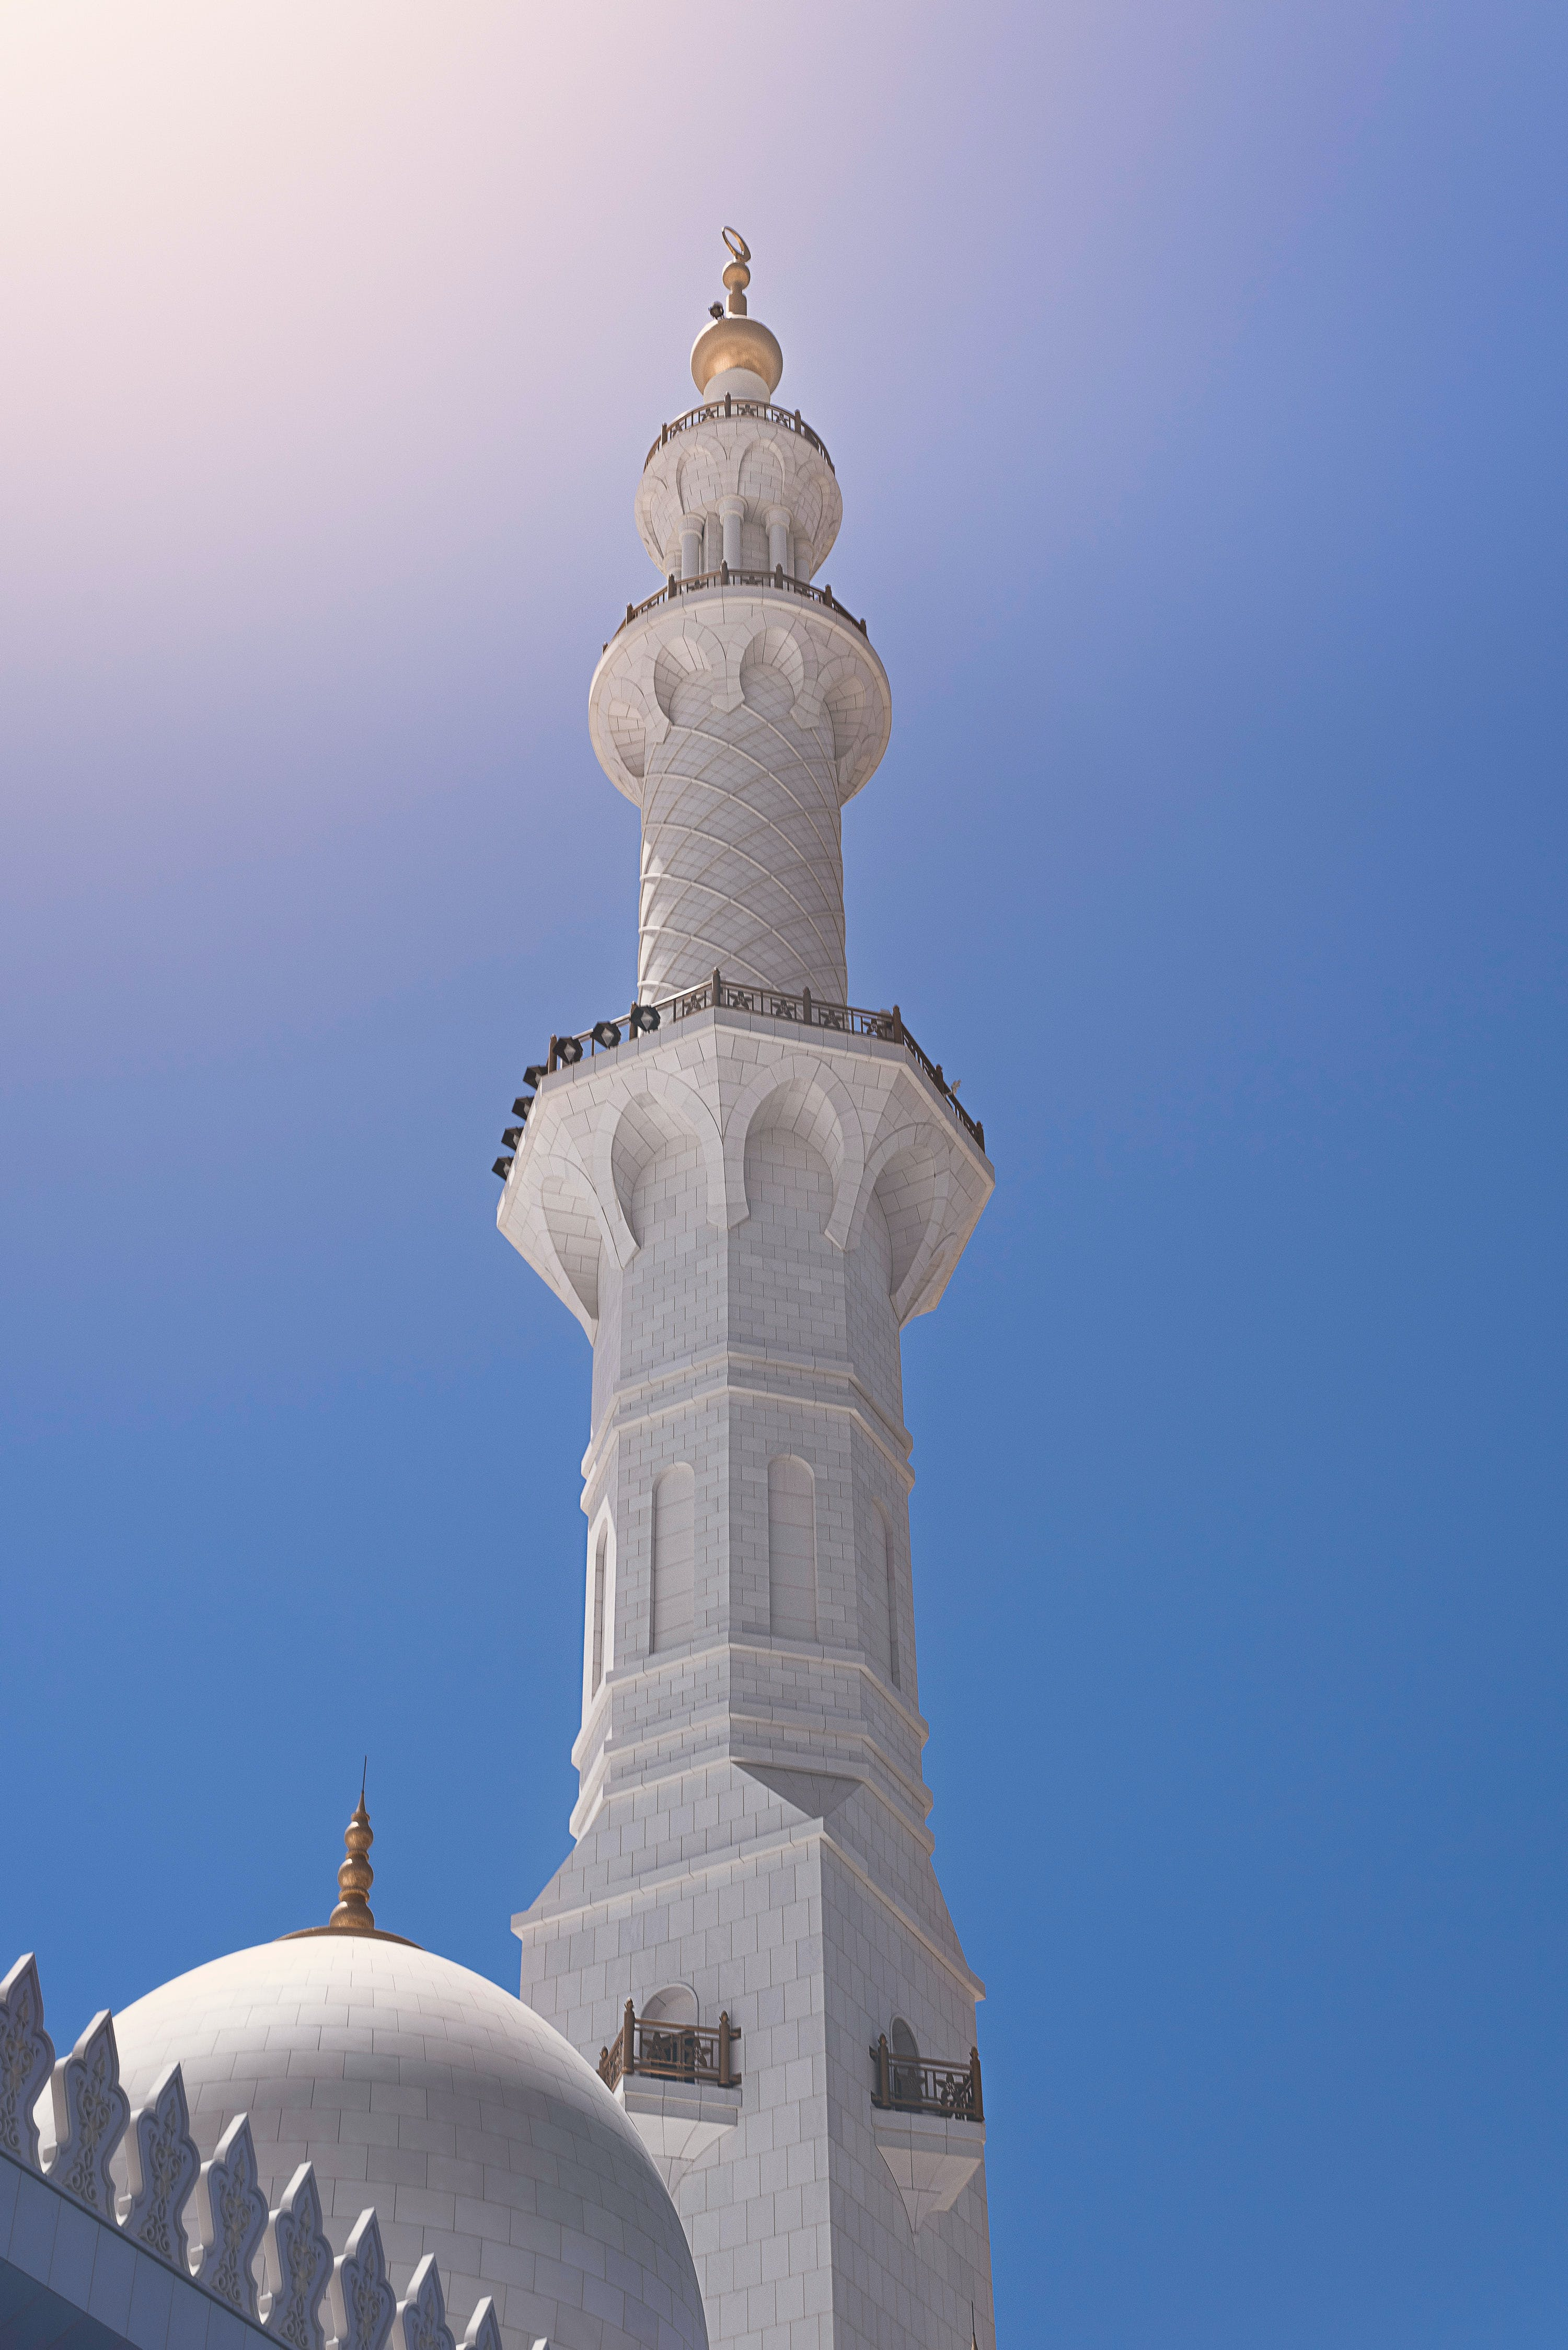 Free stock photo of grand mosque, Sheikzaidgrandmosque, sun